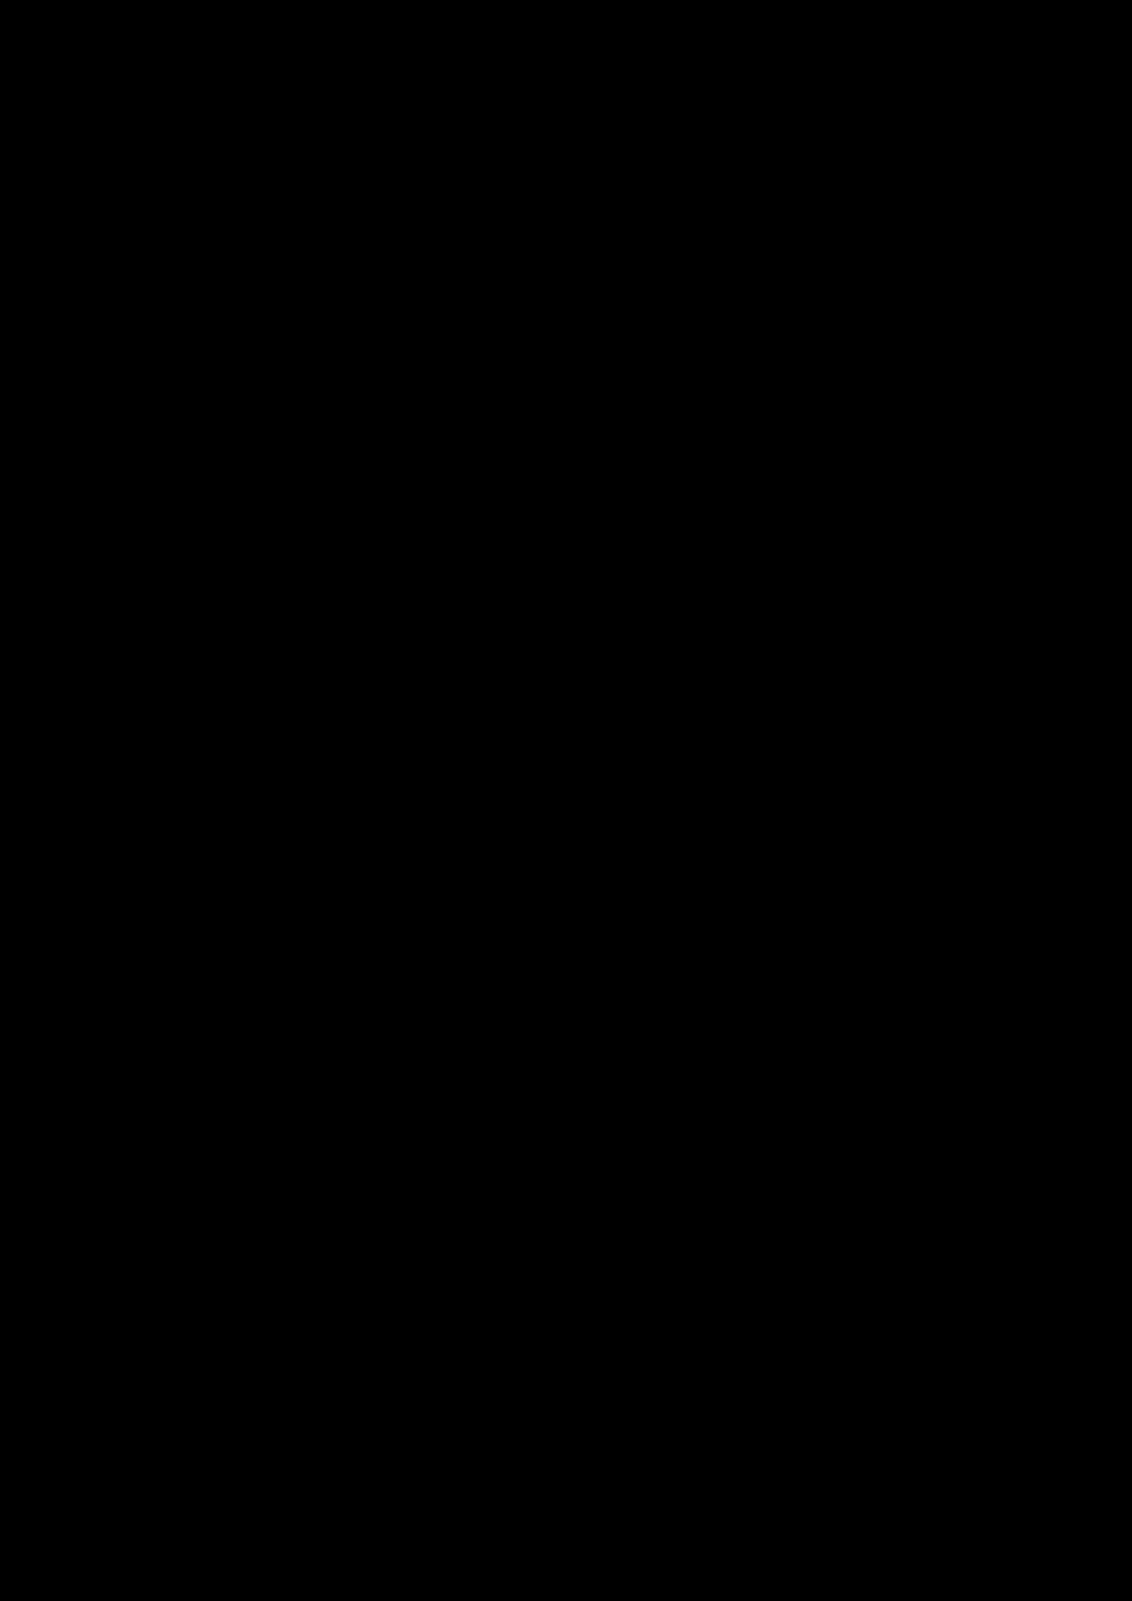 Belyiy sokol slide, Image 158